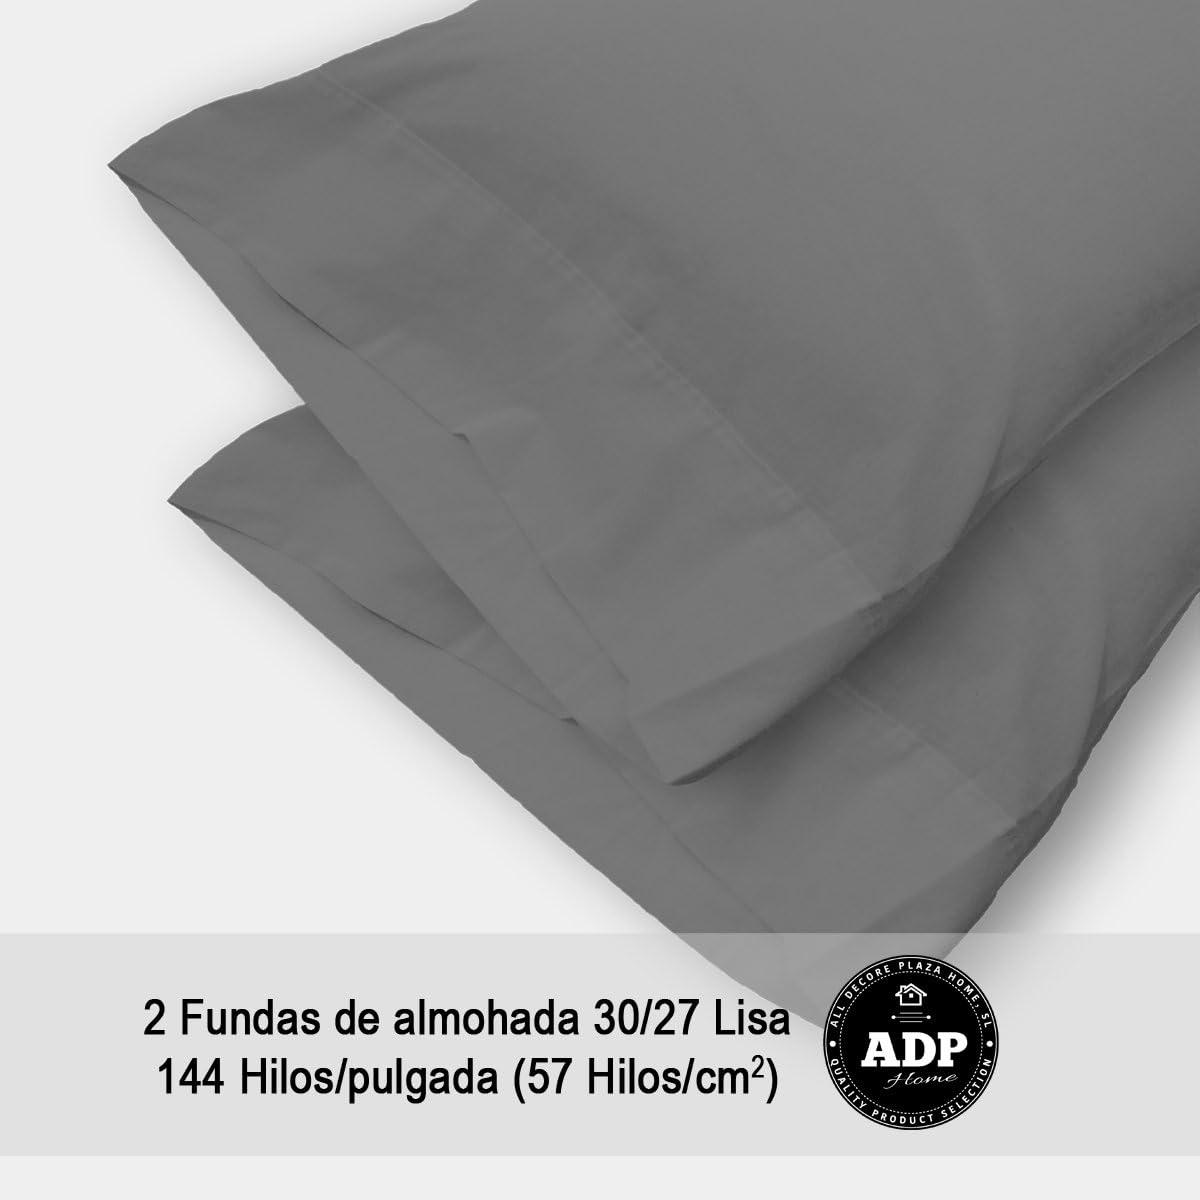 Pack de 2 ud. de 70 cm ADP HOME QUALITY PRODUCT SELECTION Funda DE Almohada Lisa 144 Hilos ALL DECORE PLAZA HOME S.L